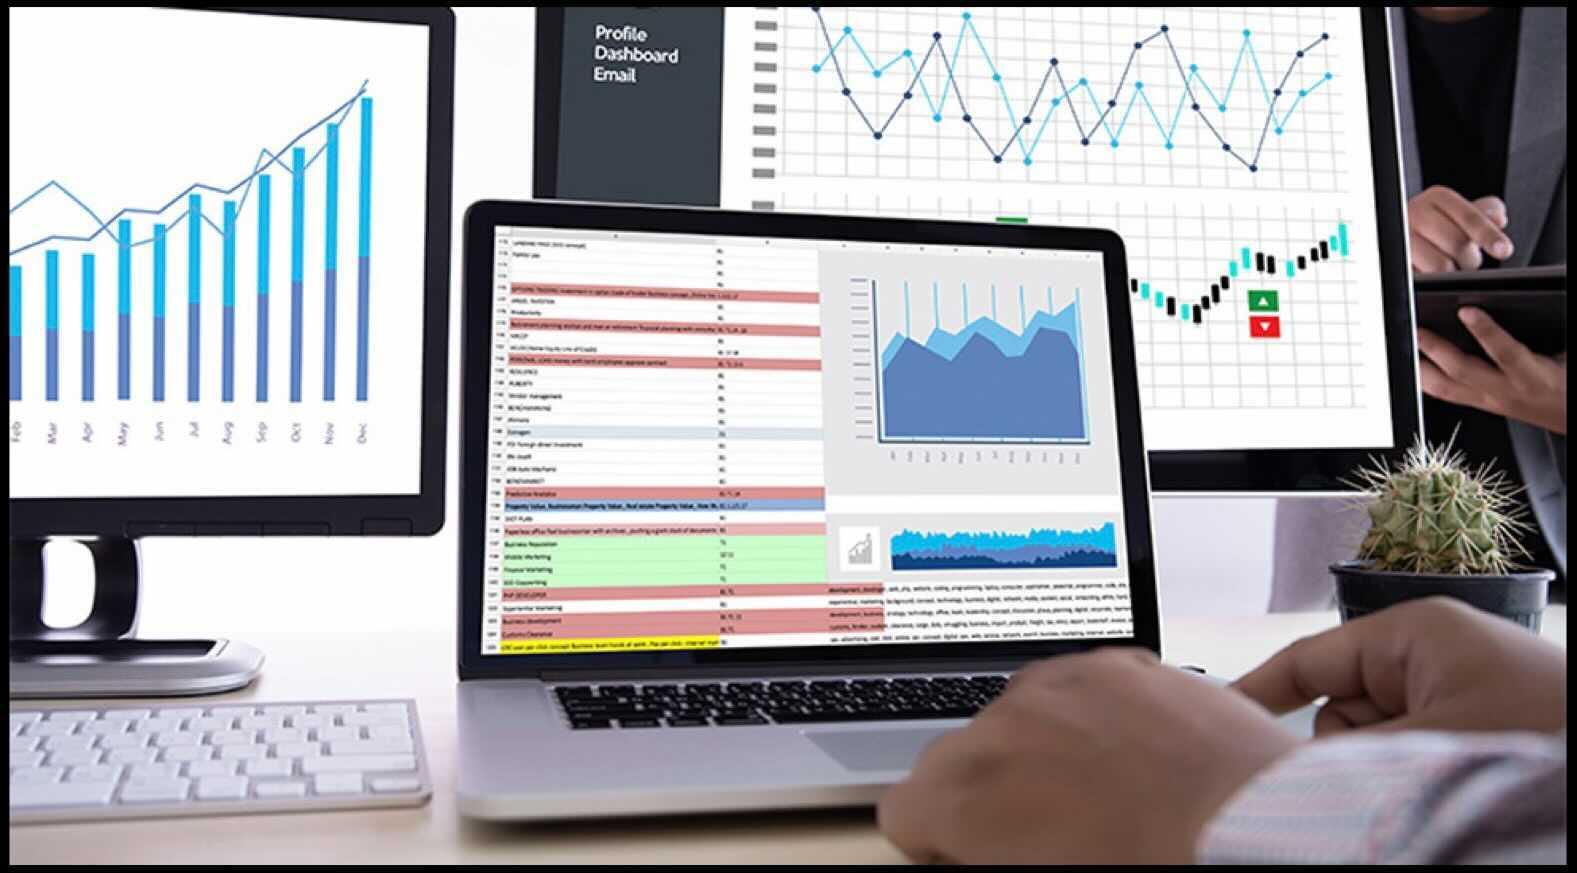 Event Marketing Analytics On Multiple Screens